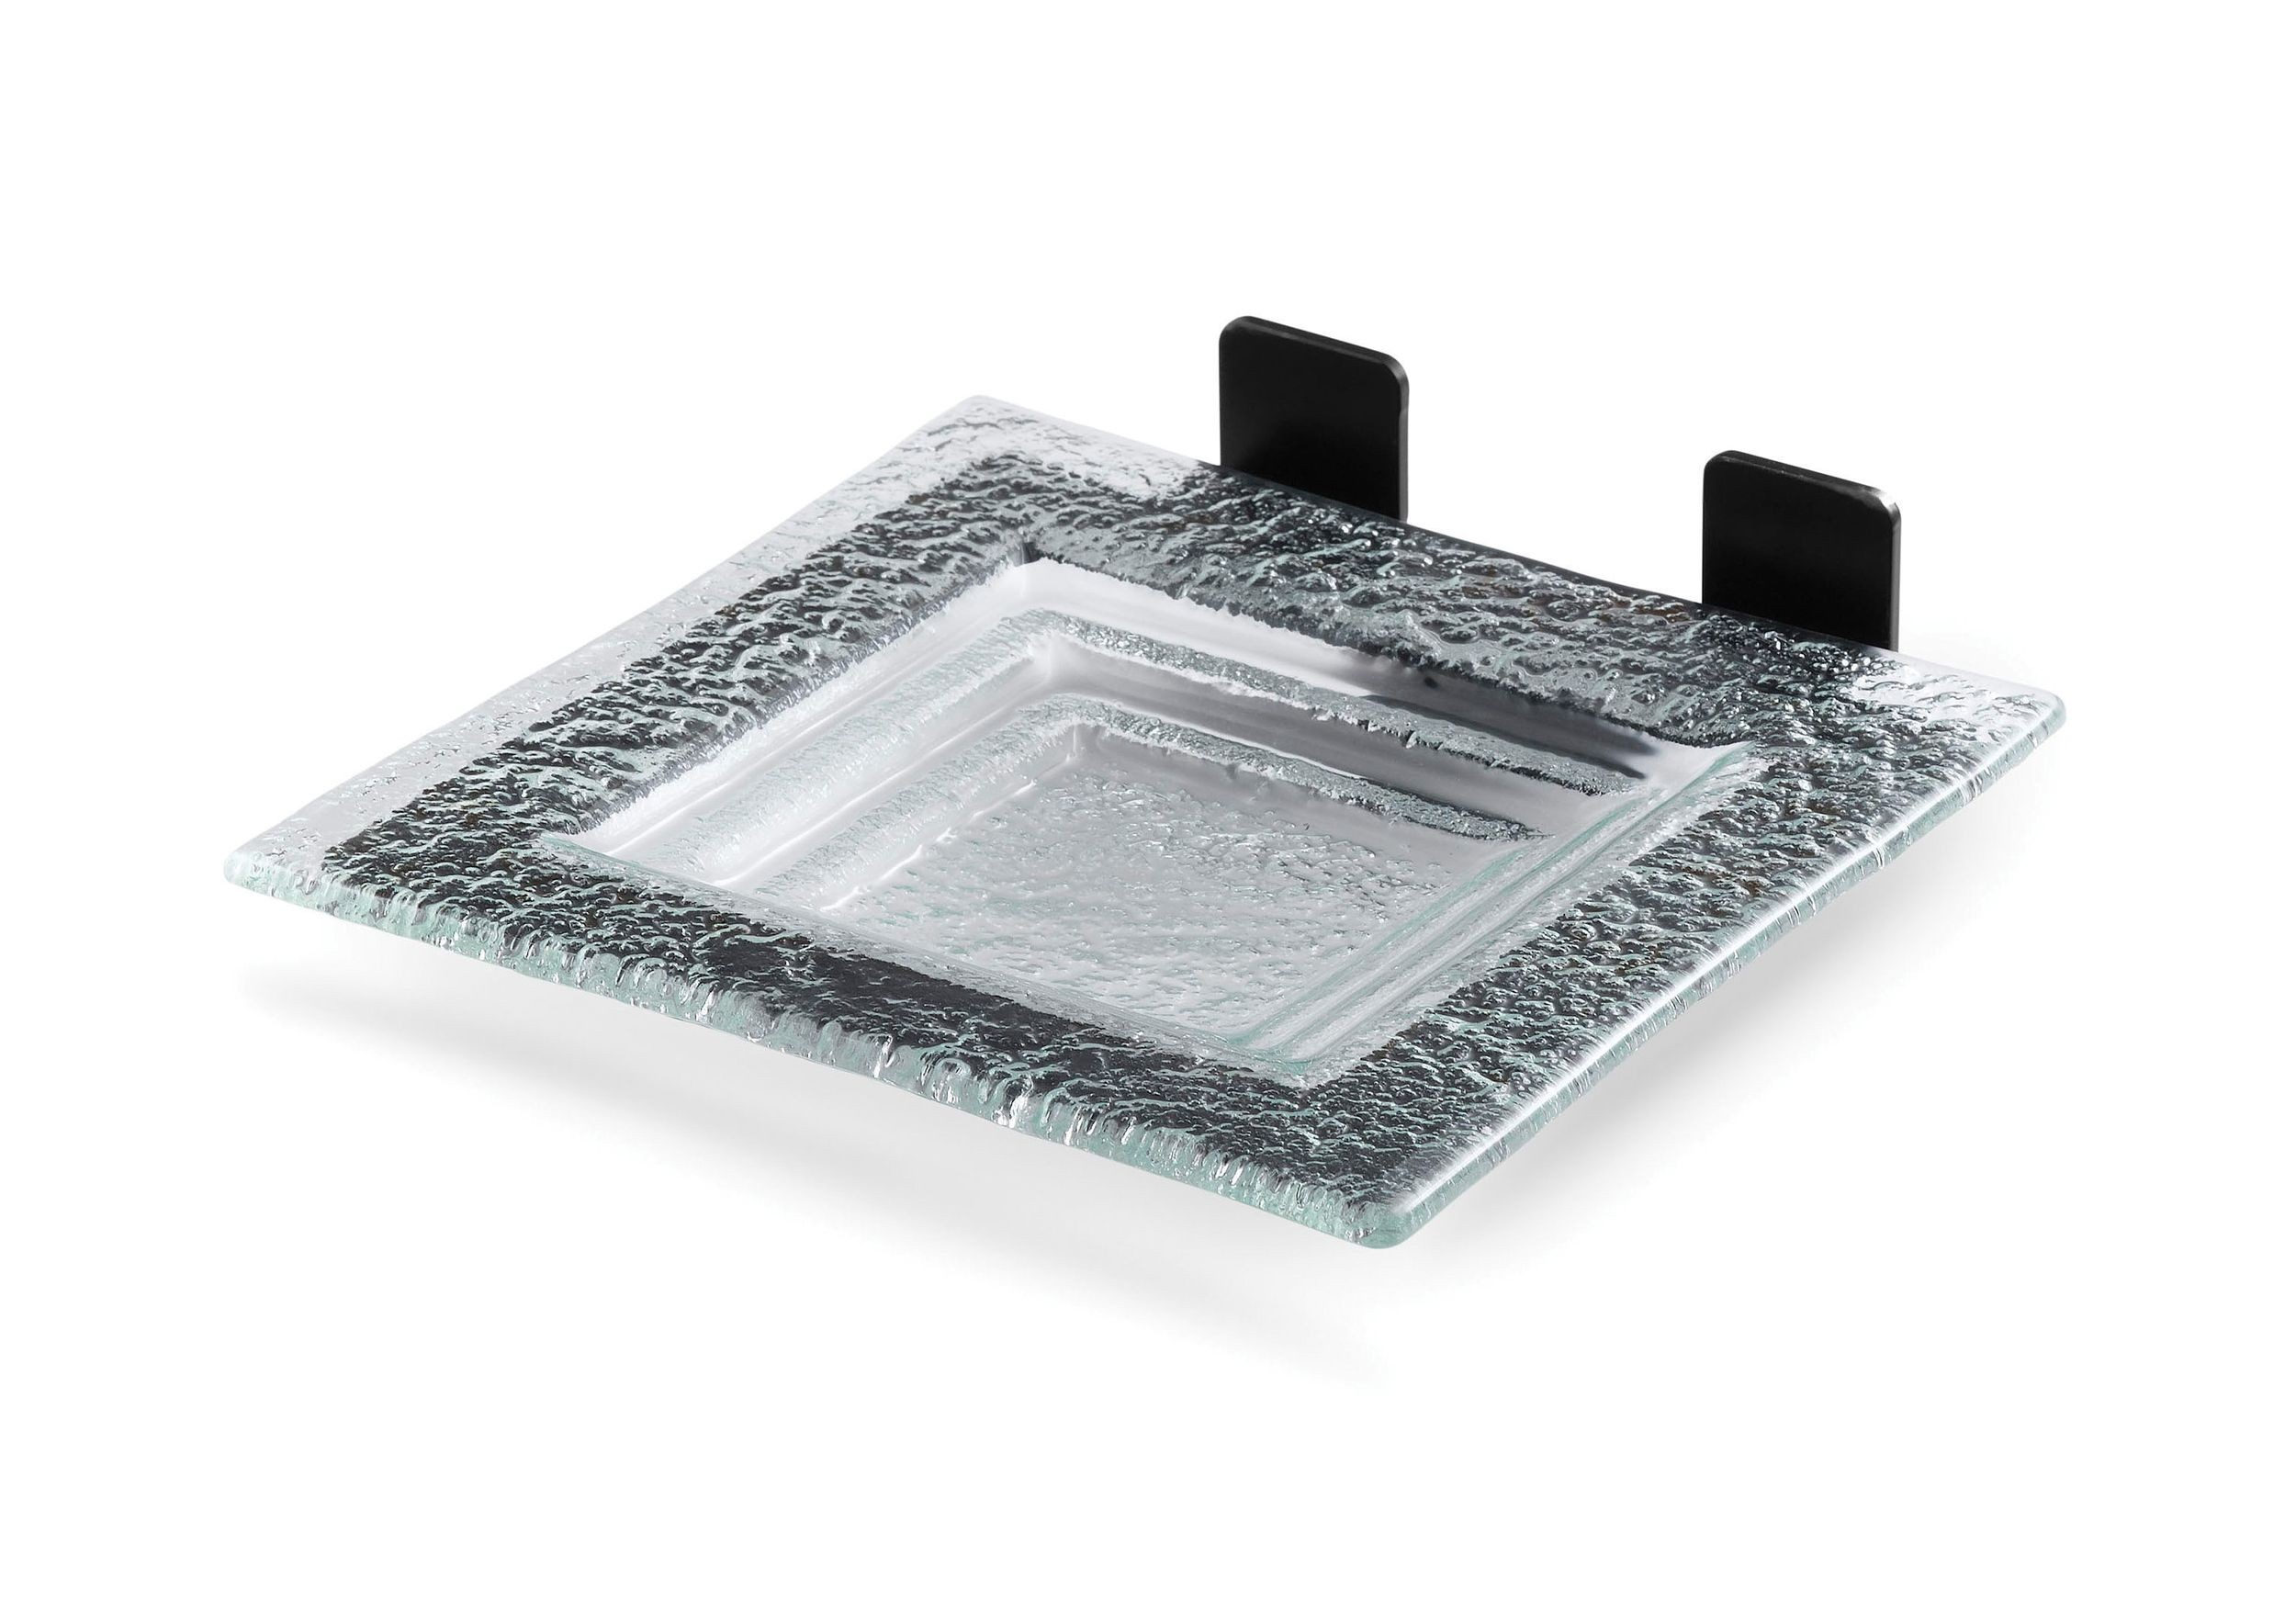 Square Green Glass Shelf for  Includes: 1 Glass Platter, Black Matte Metal Frame- 8.5